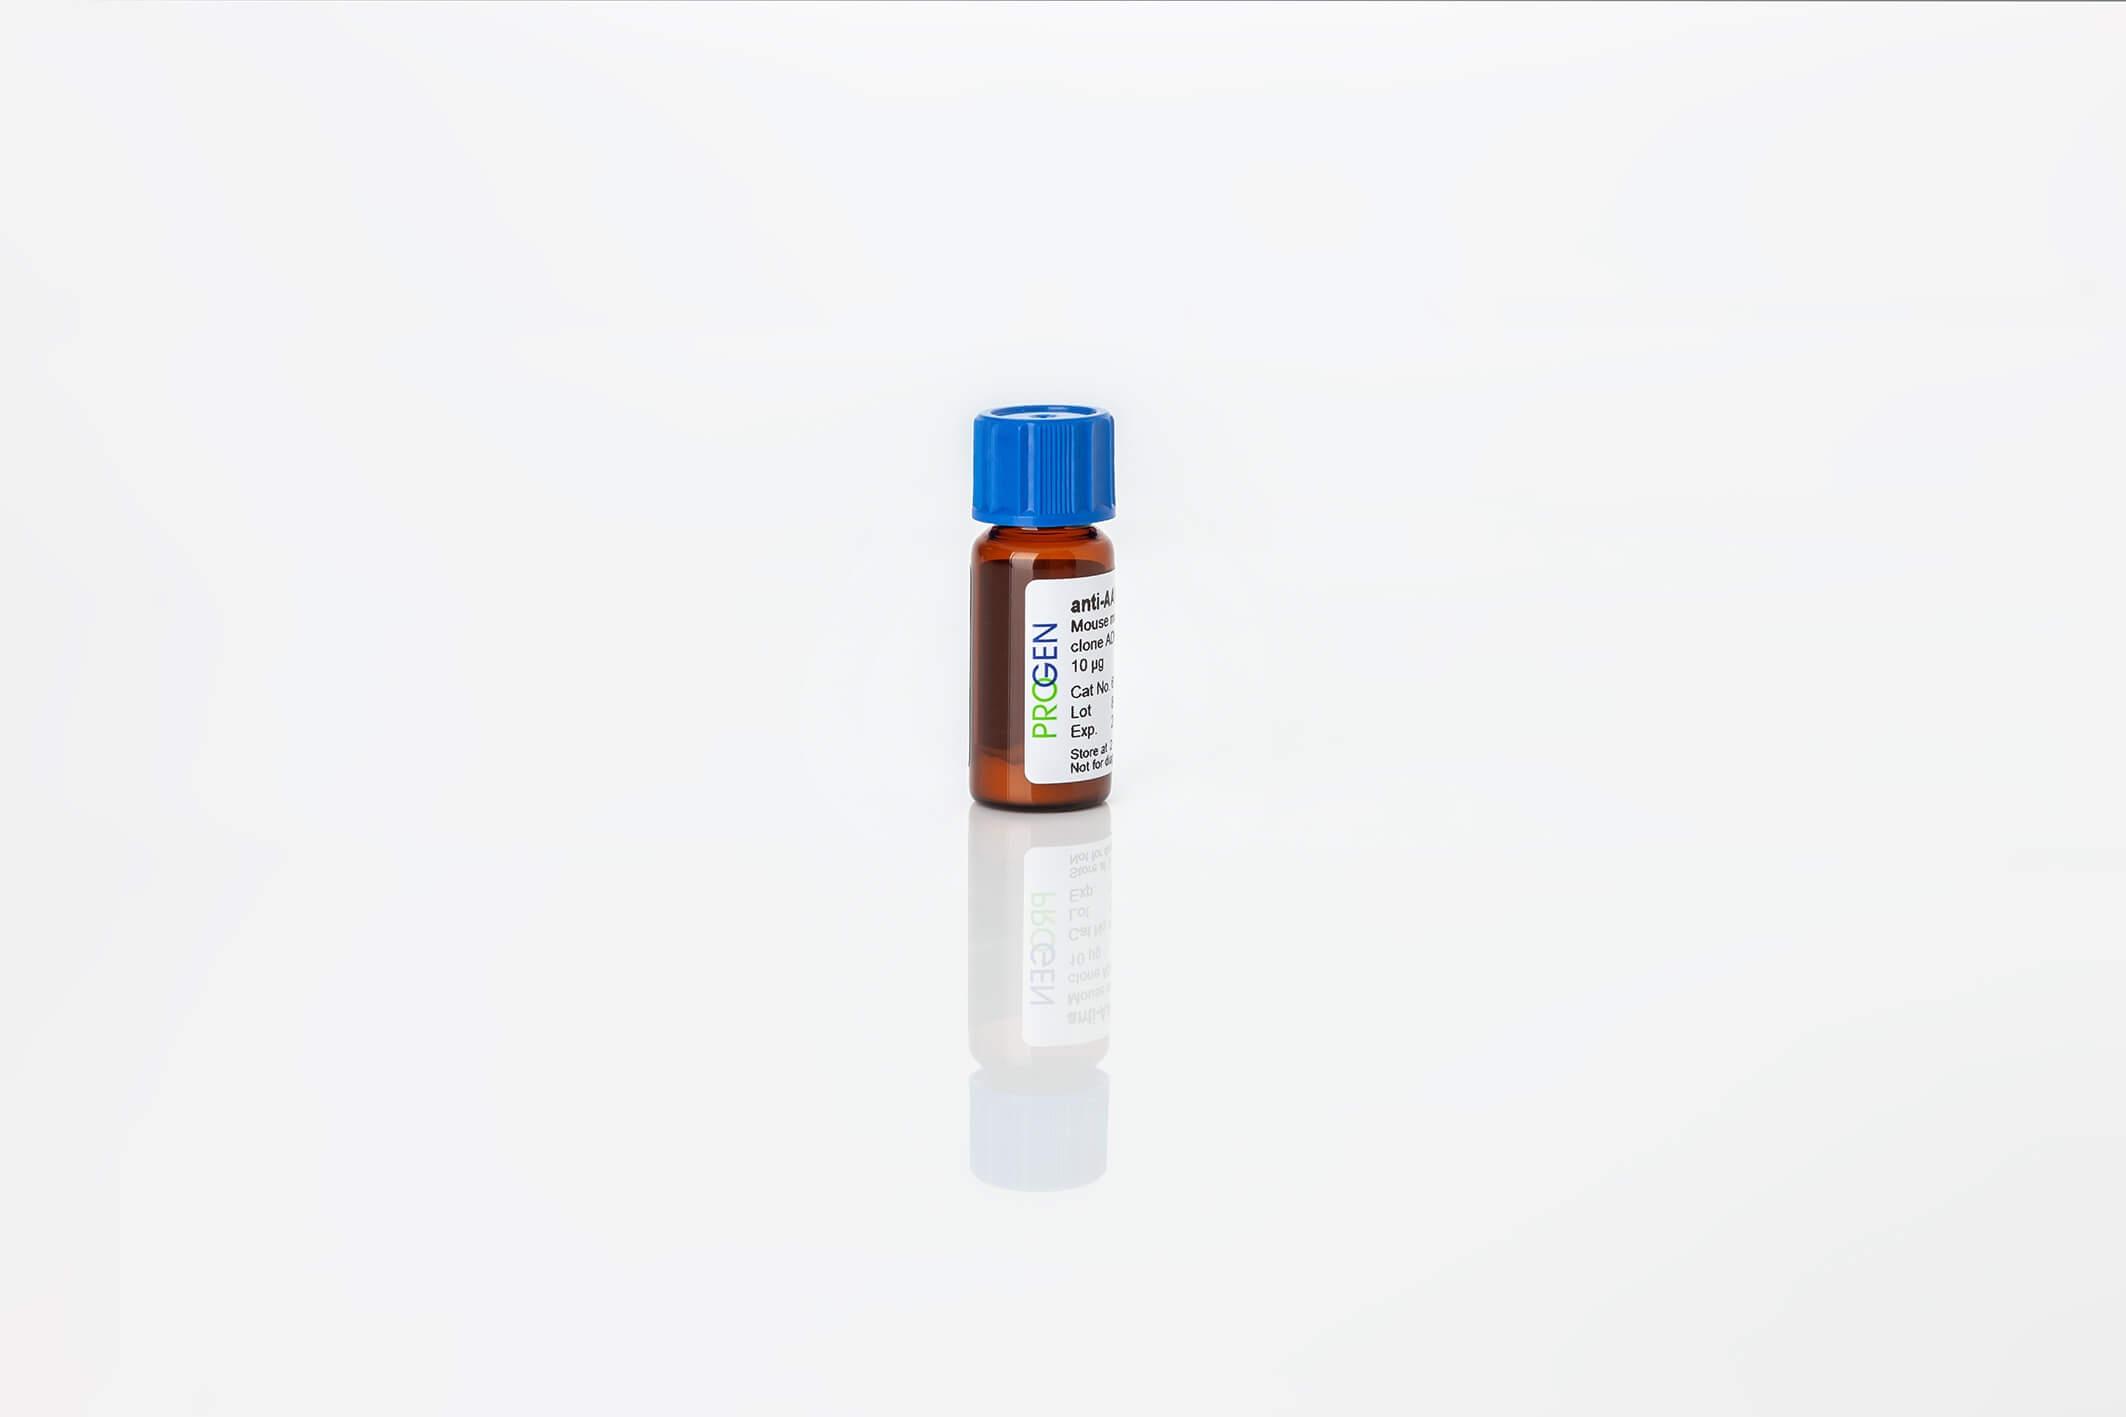 anti-Lamin mouse monoclonal, X167, lyophilized, purified